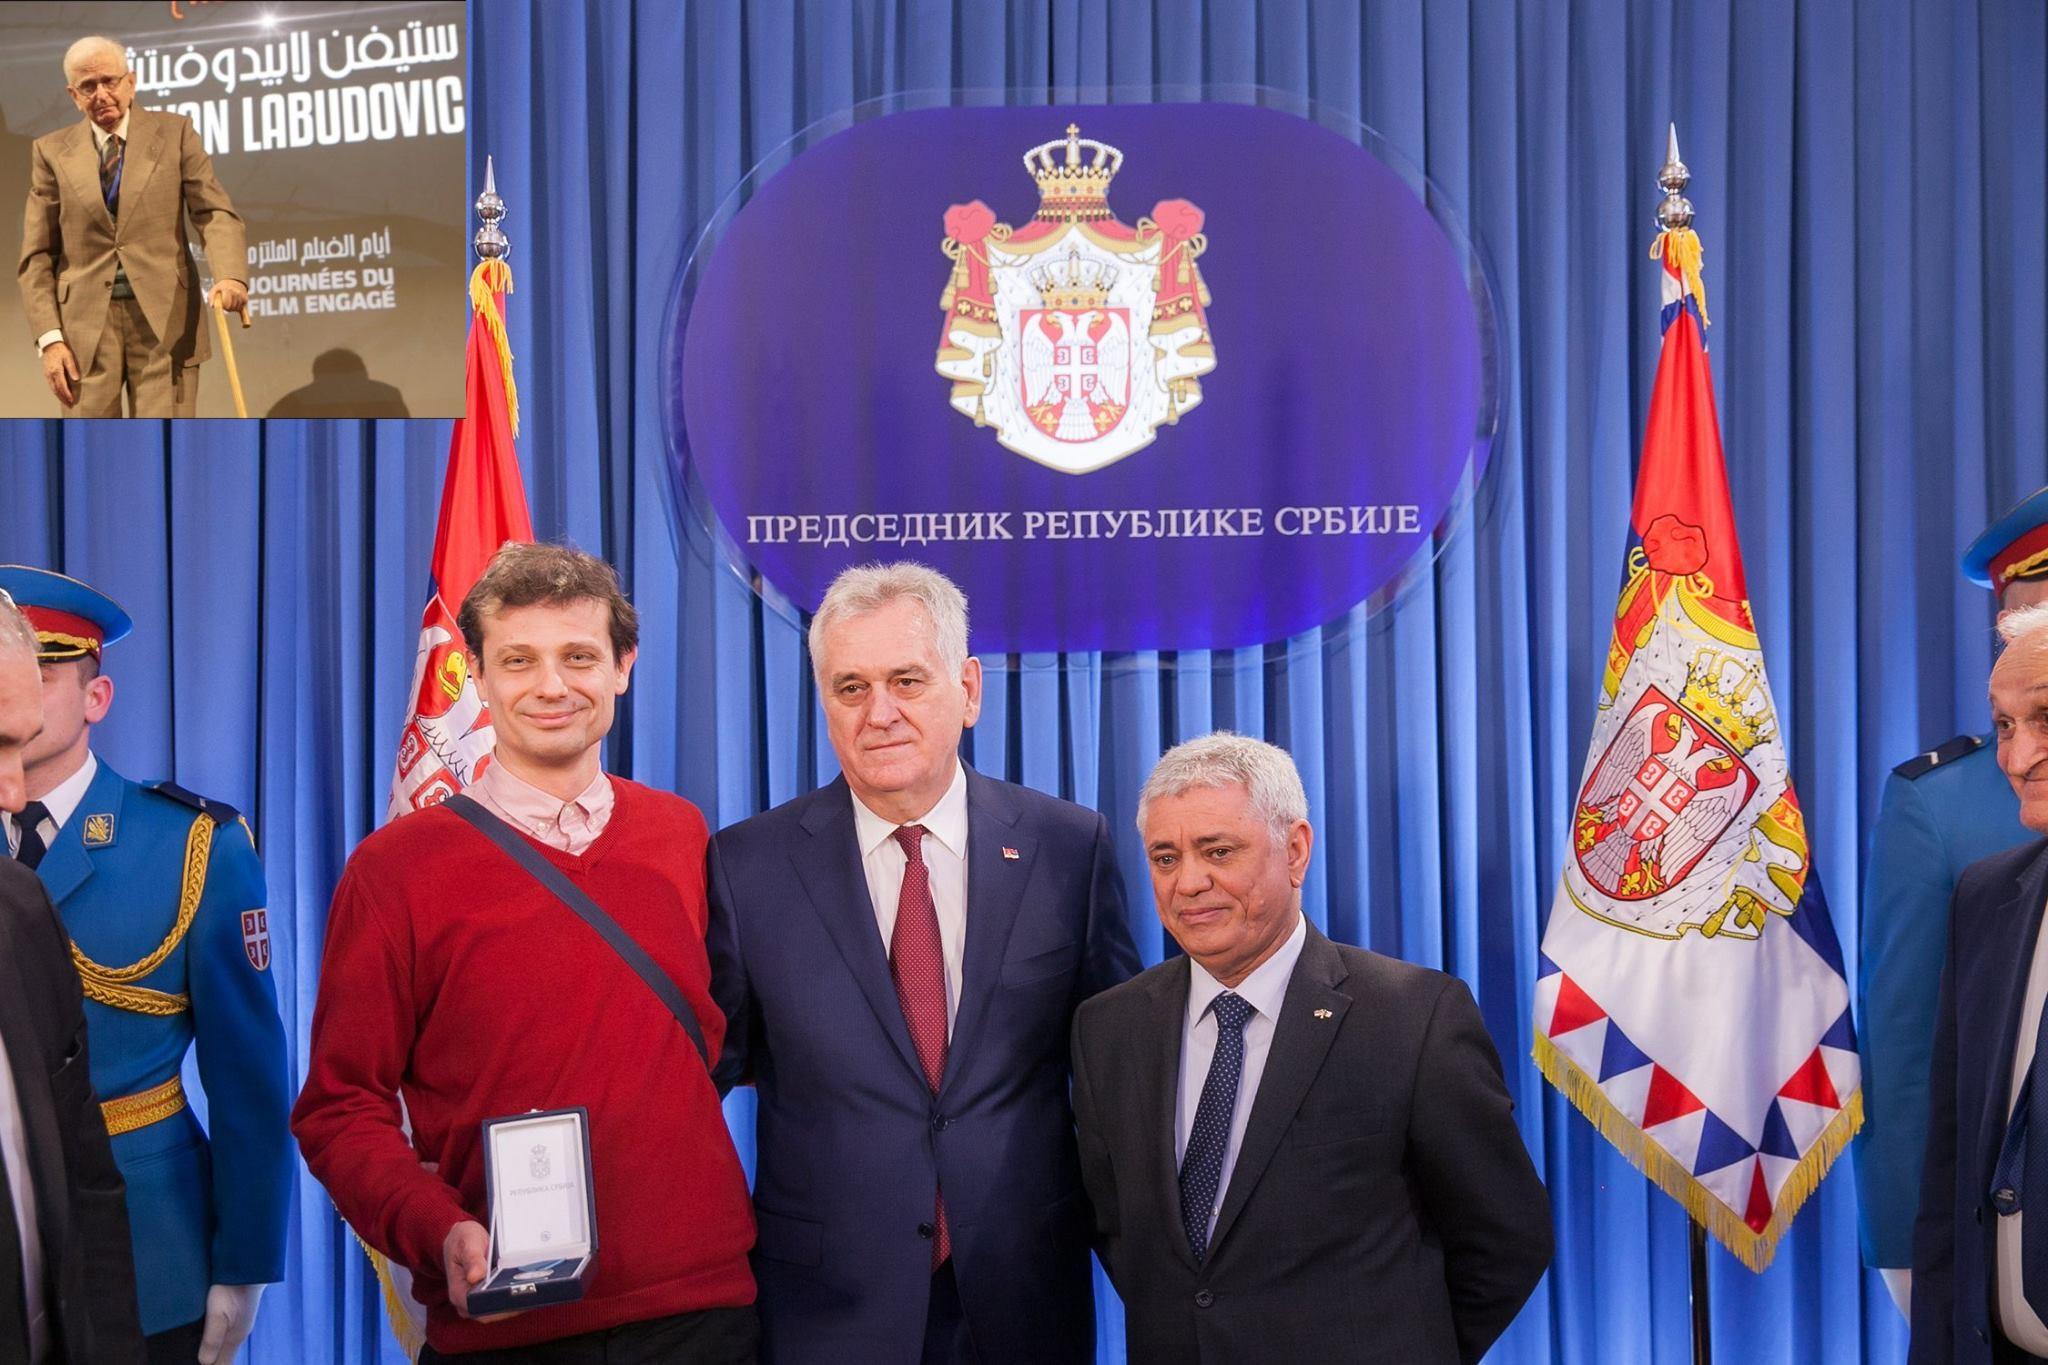 Stevan Labudovic décoré par le Président Tomislav Nikolic